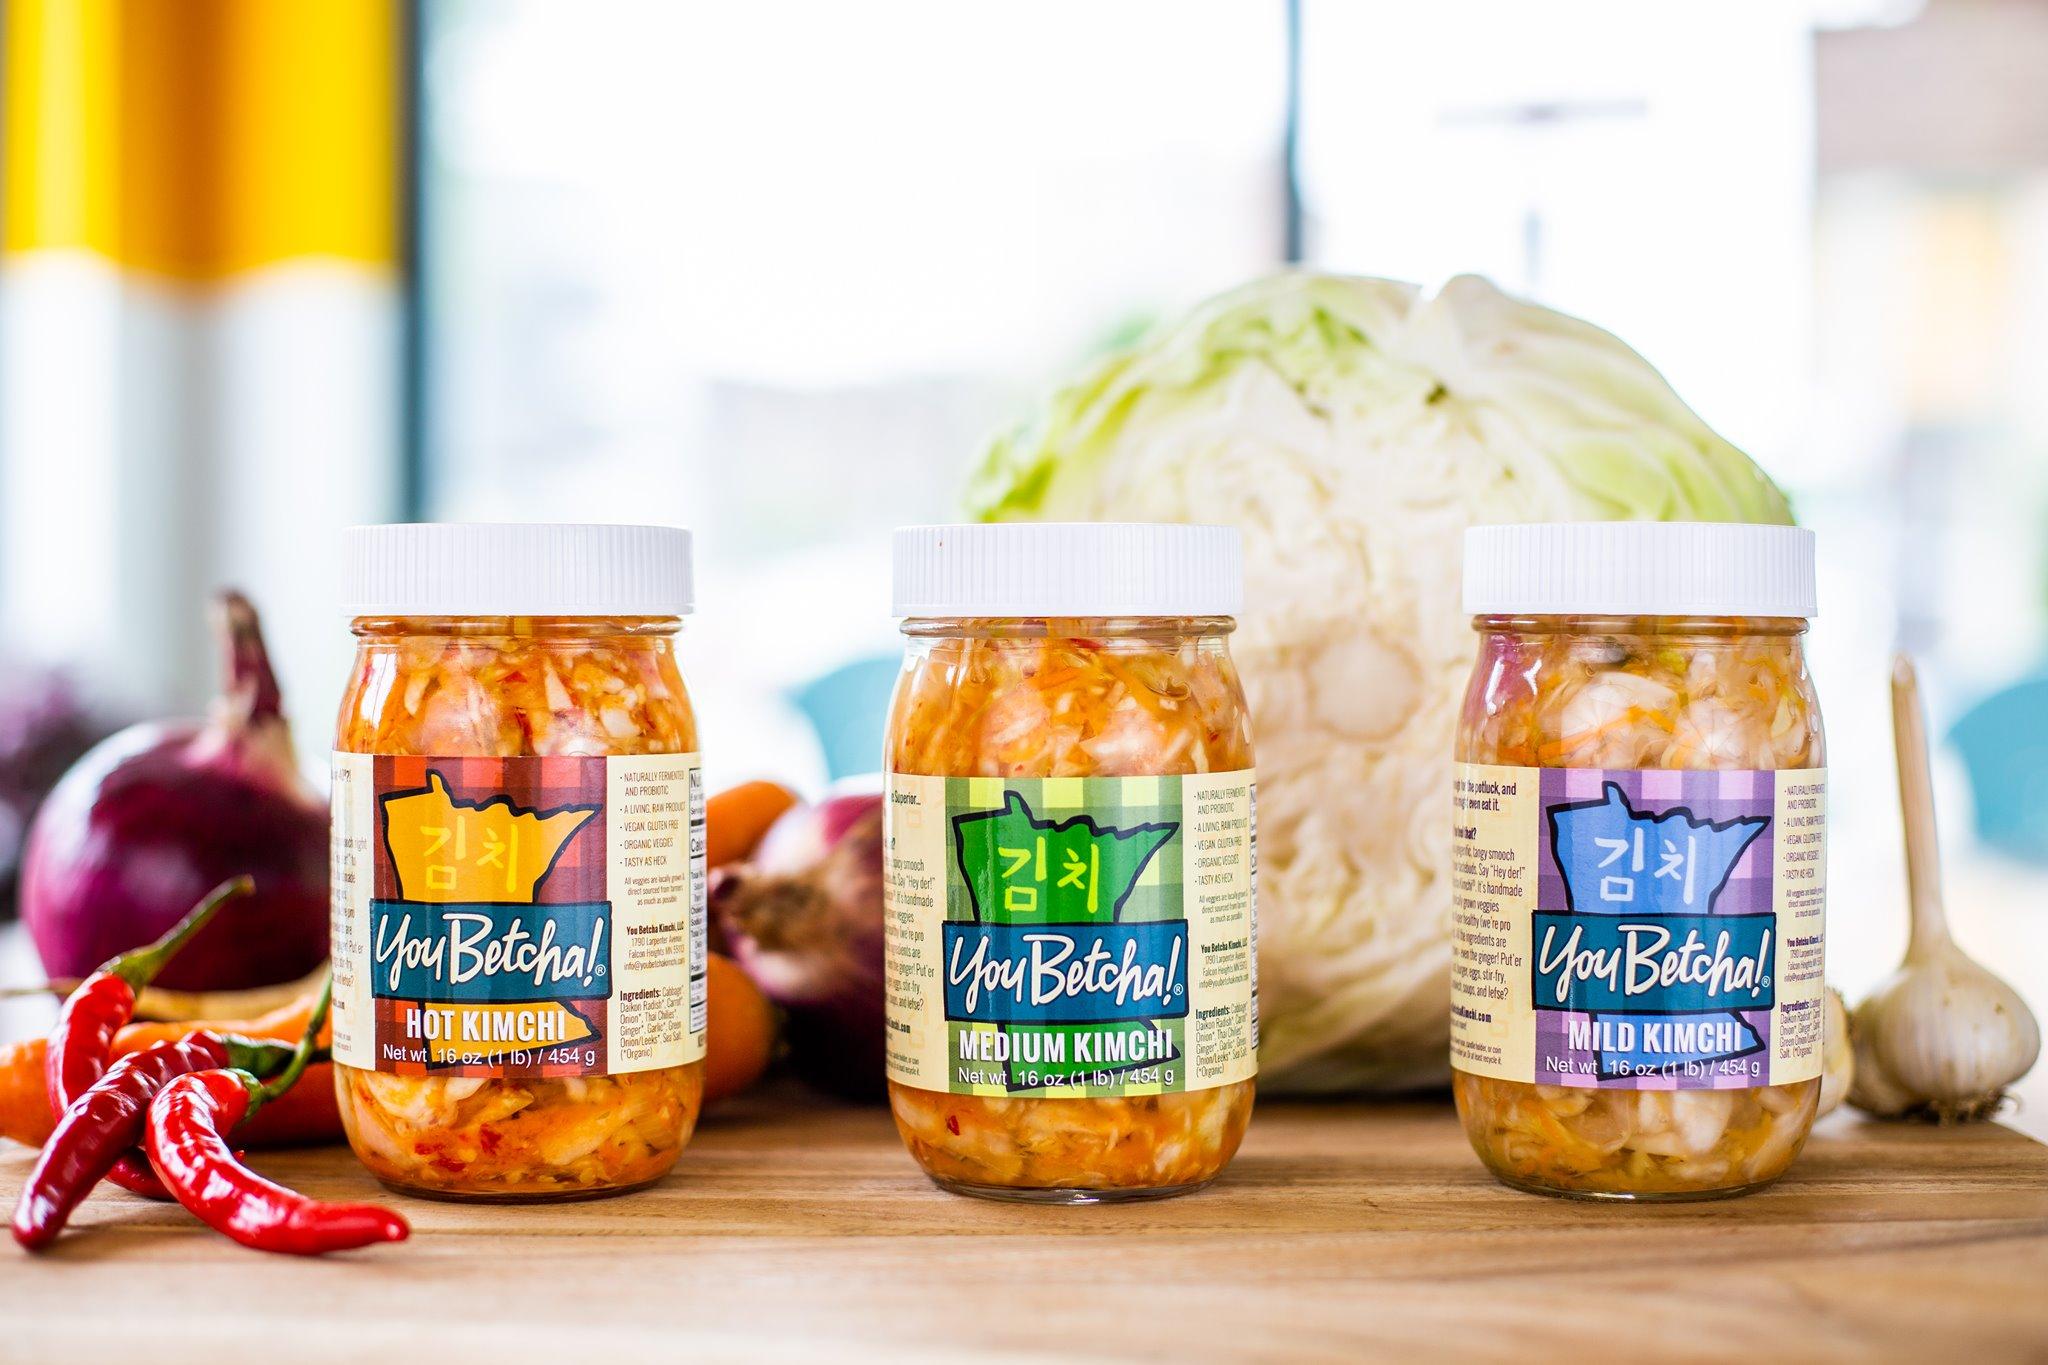 Medium Kimchi (A Bit Nippy)